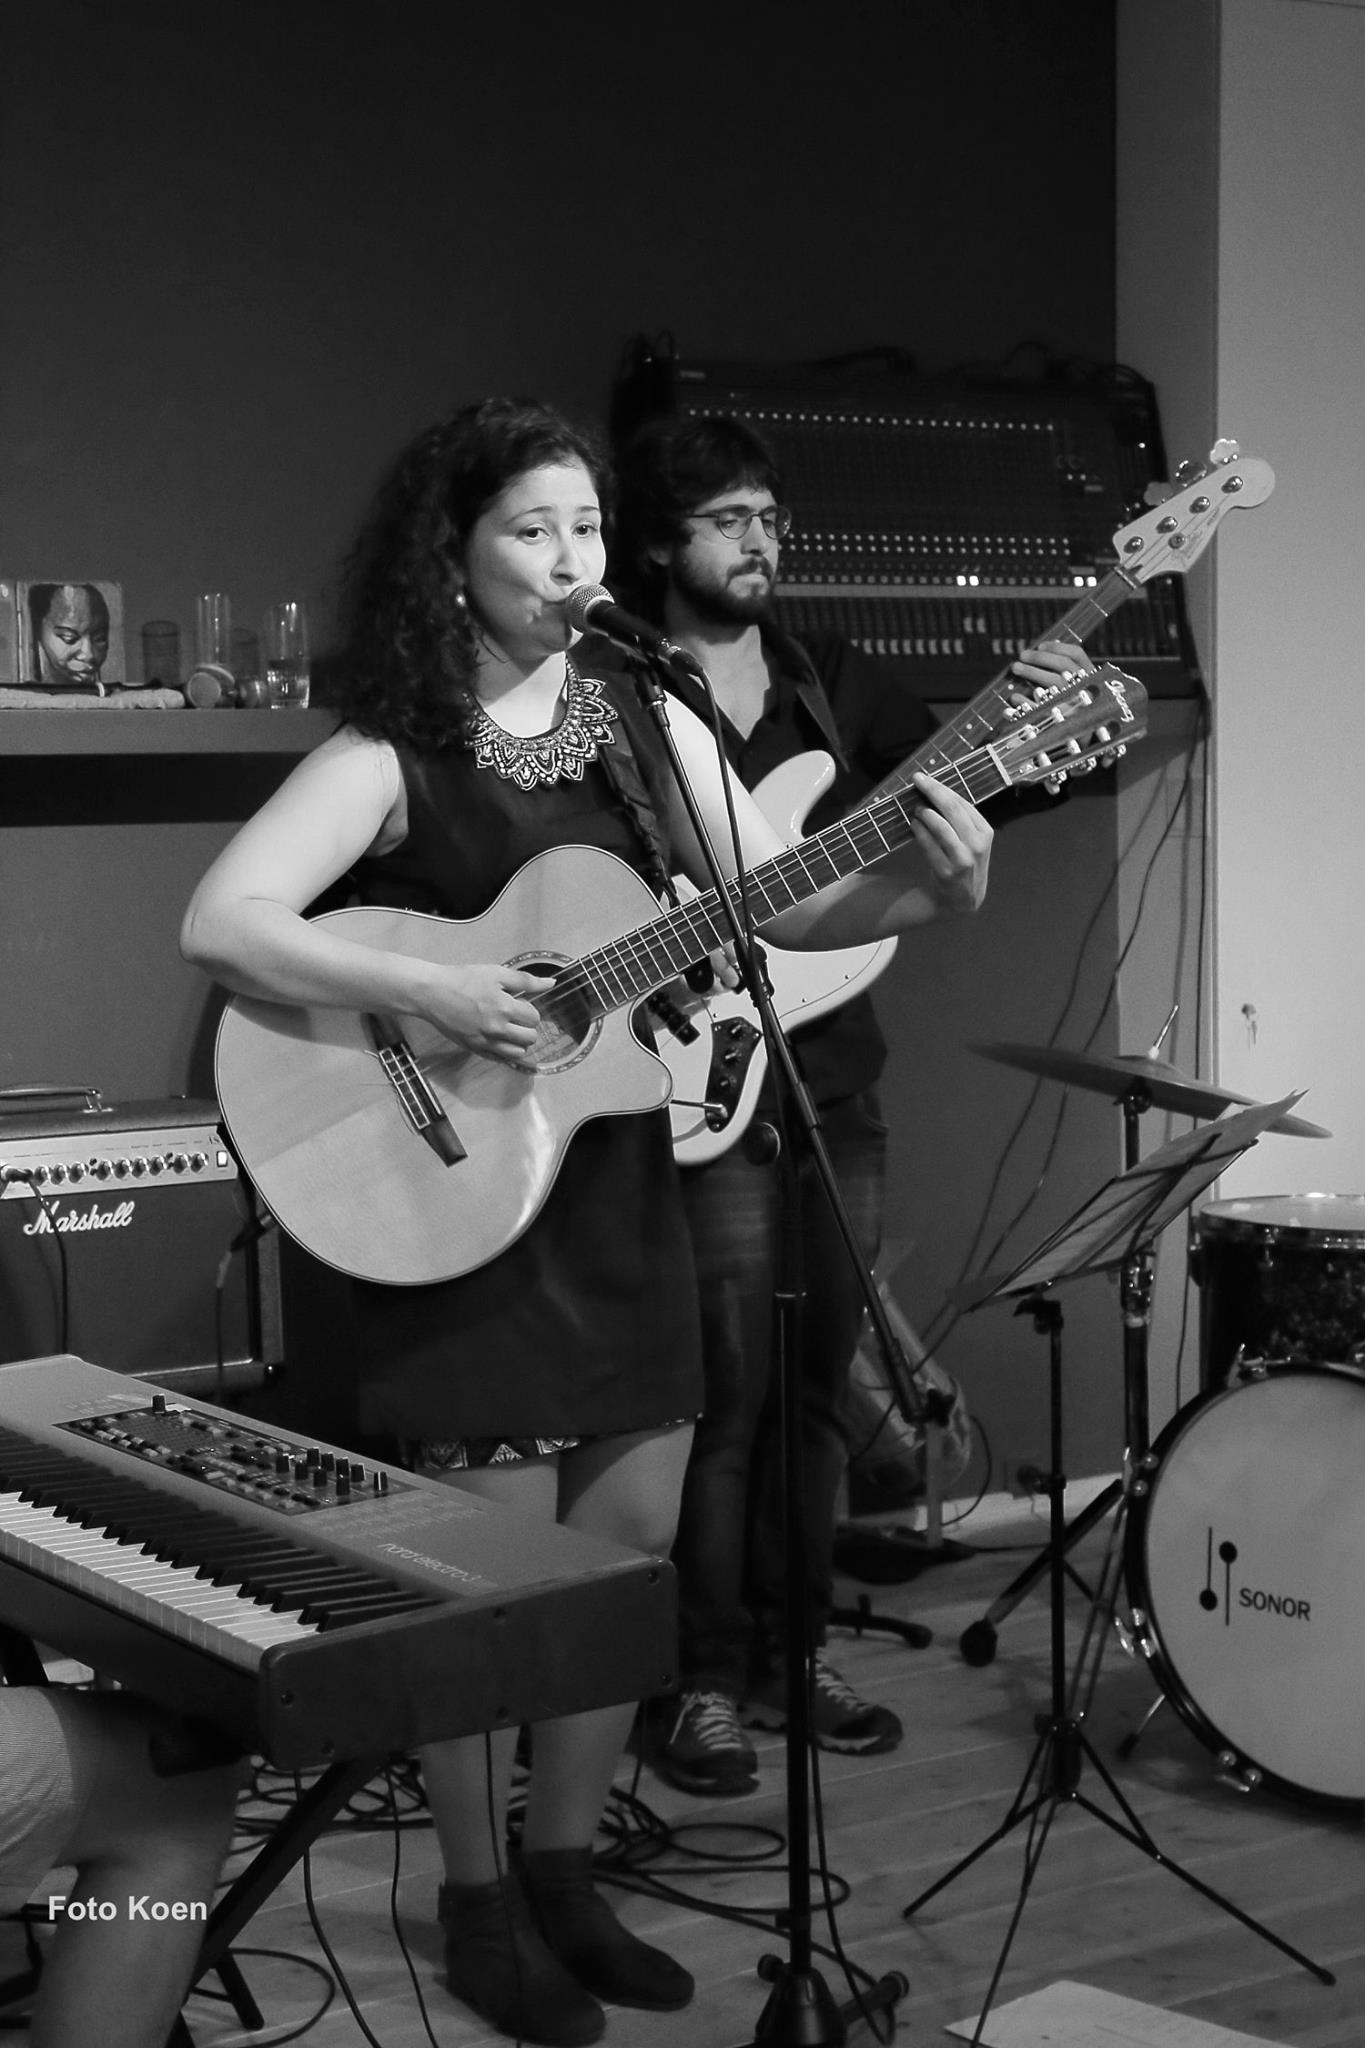 Concert at 27Bflat Jazz & Blues Eeat